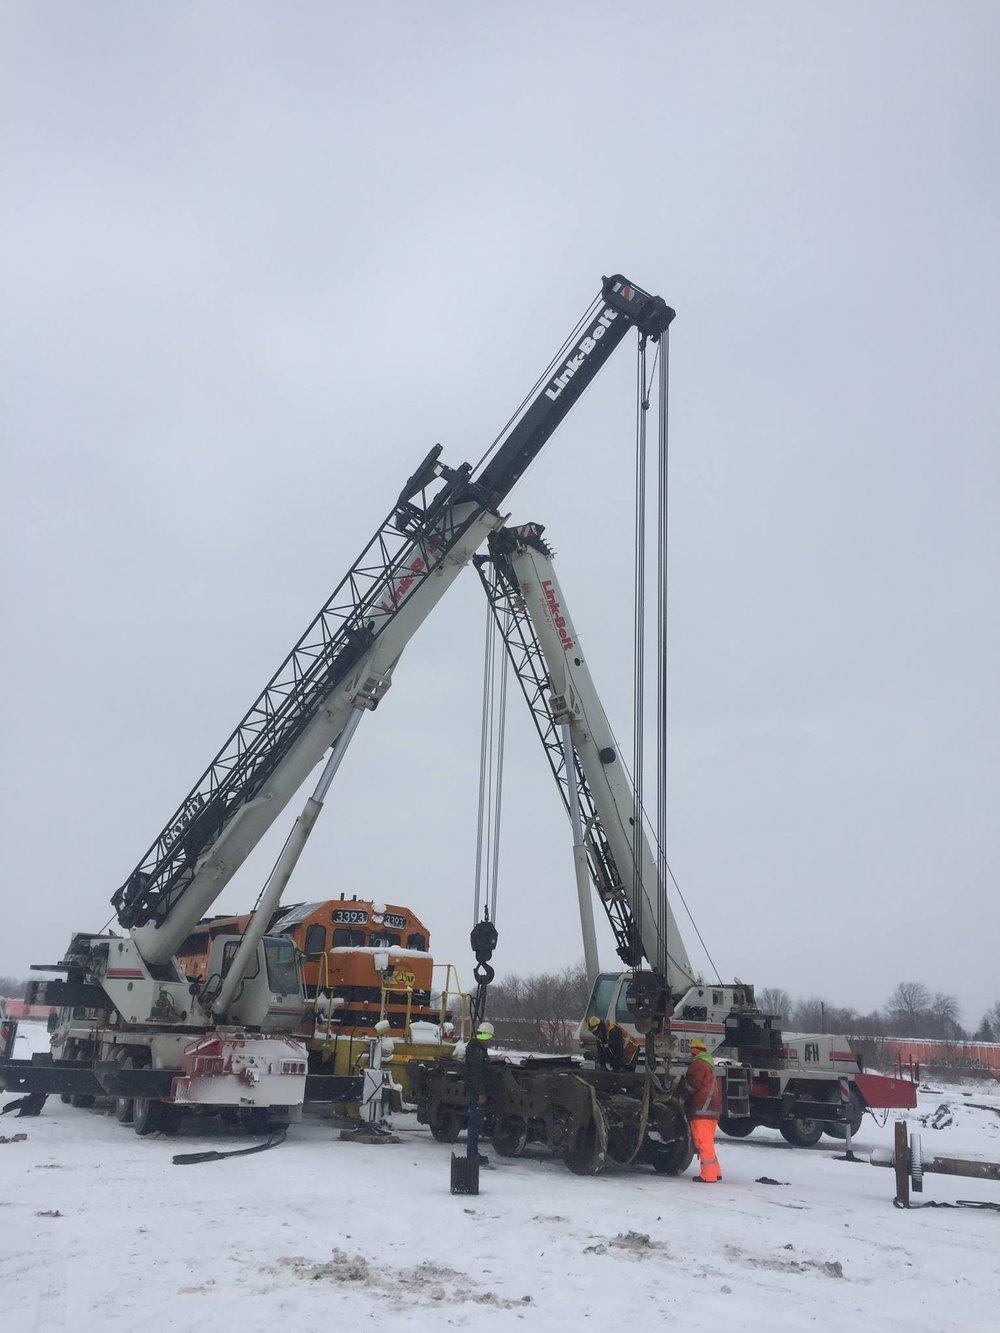 2 mobile cranes lift train car to rebuild motor